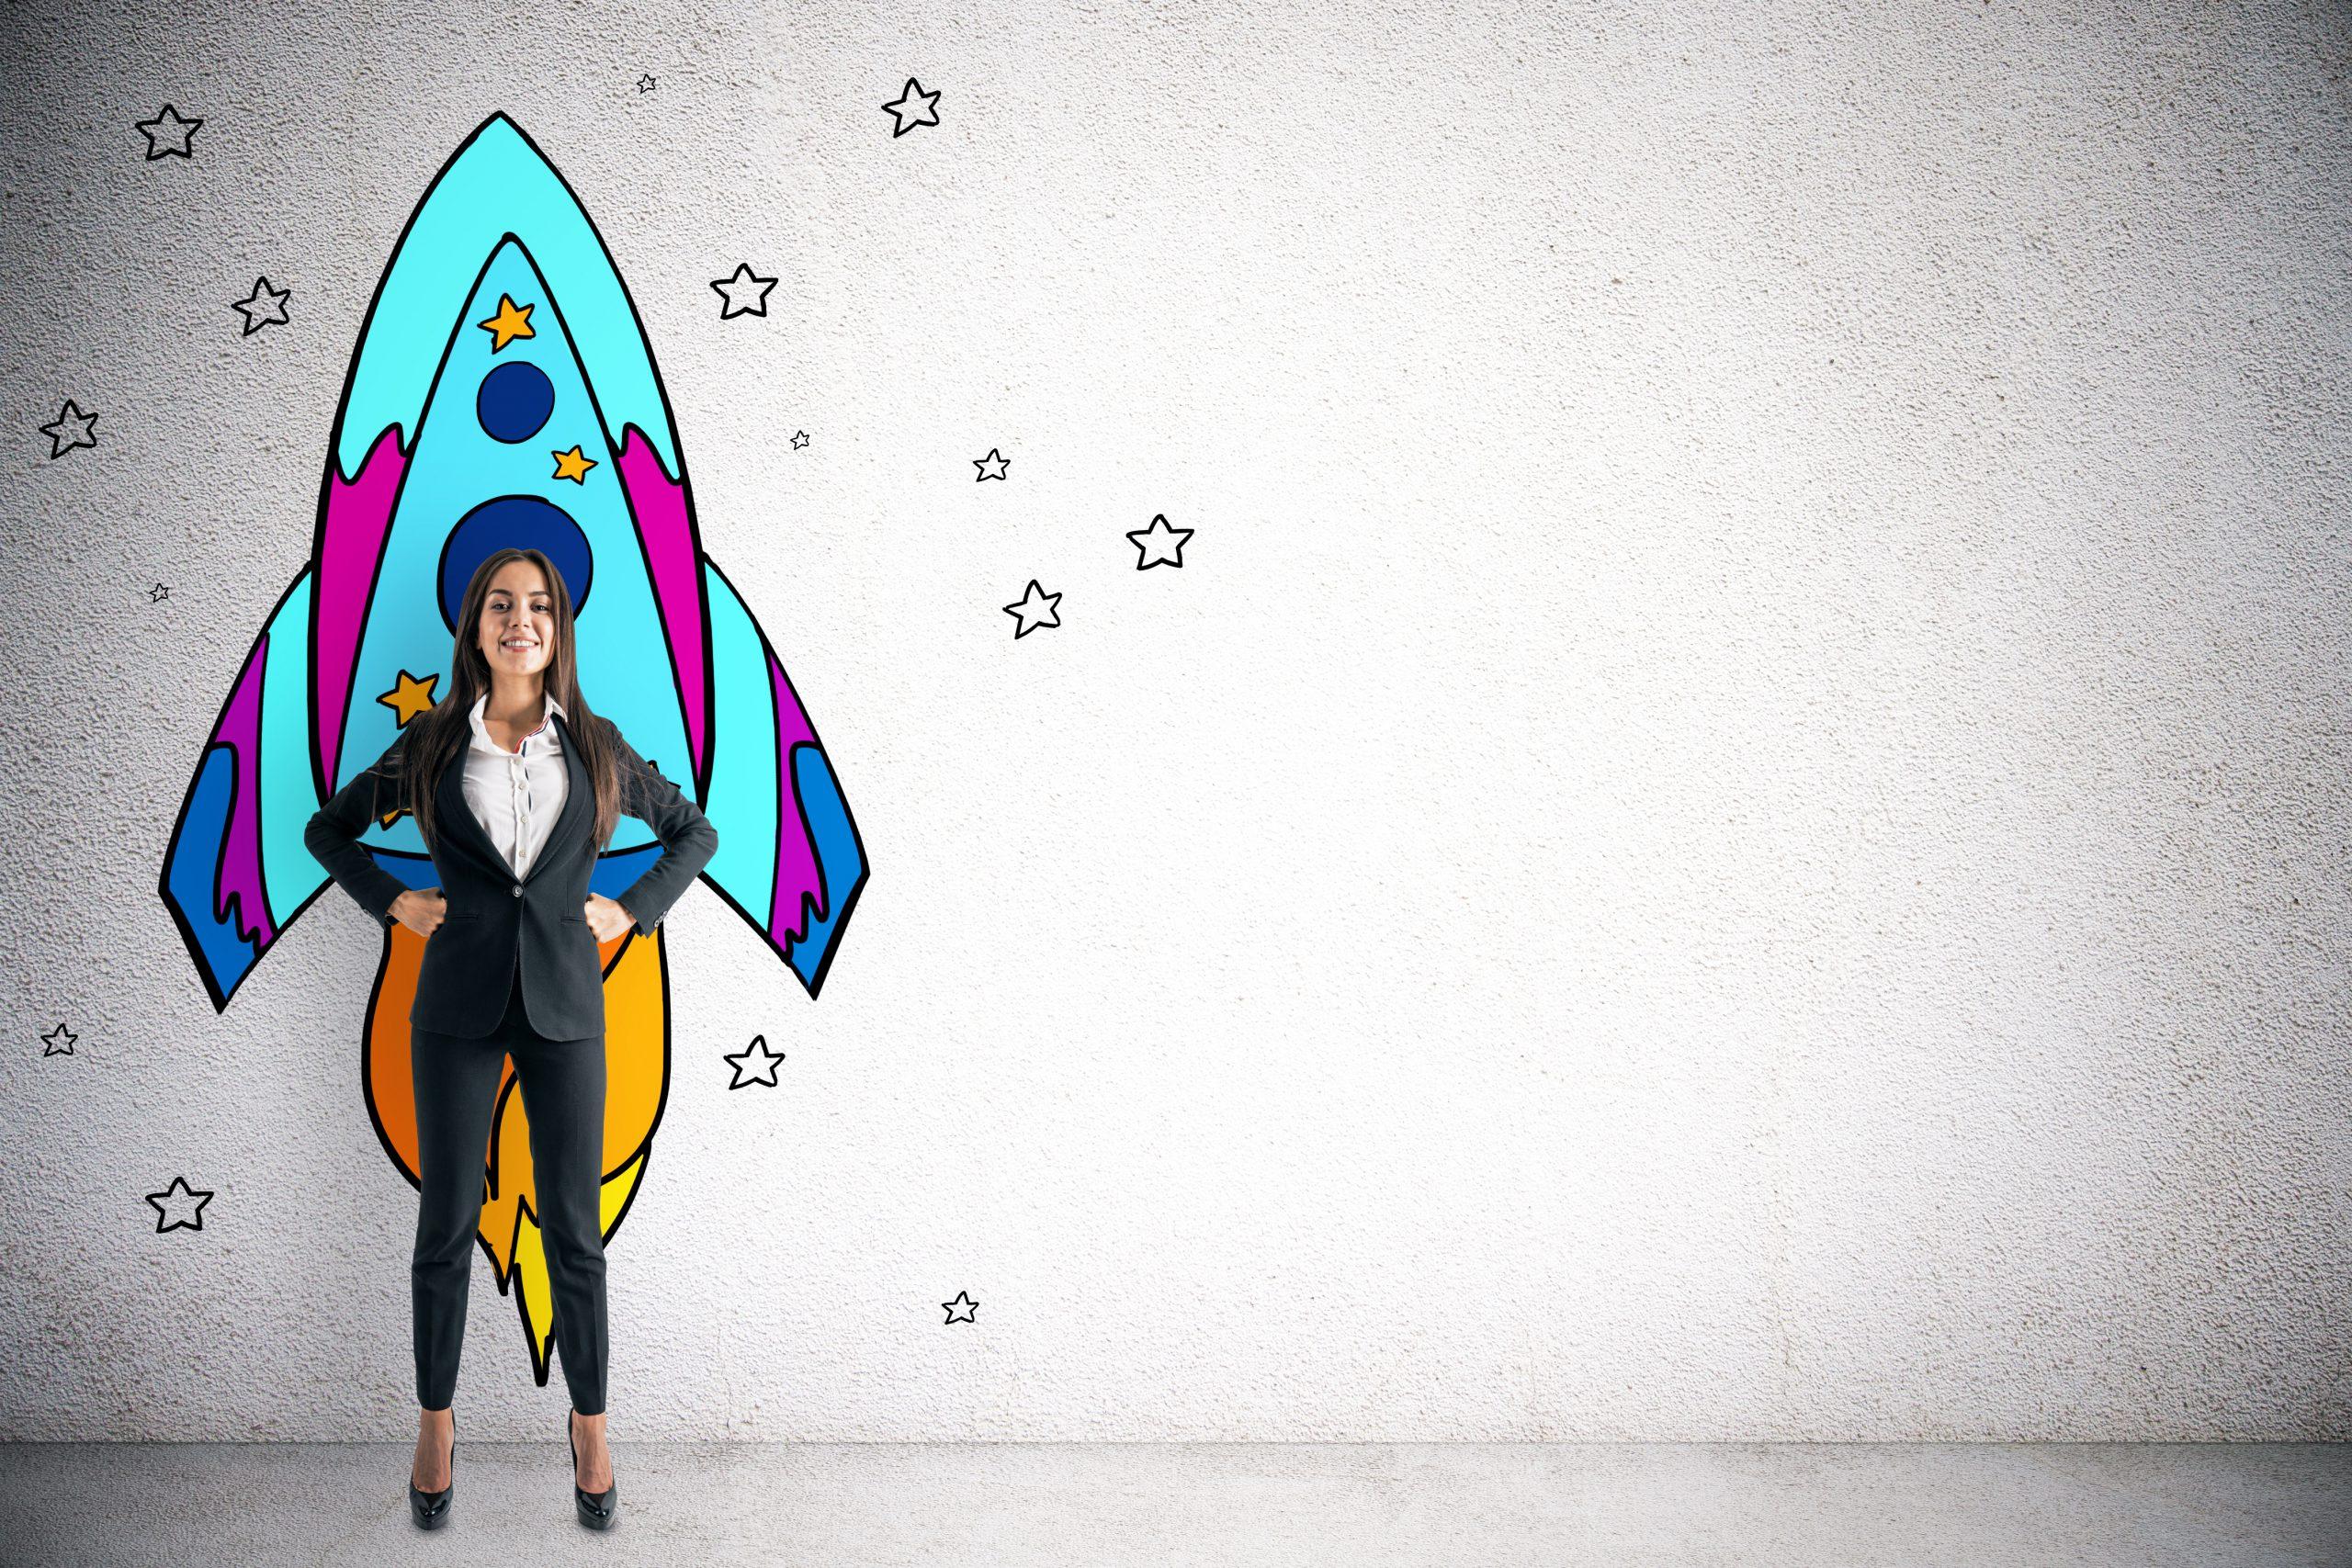 IA startups ambition